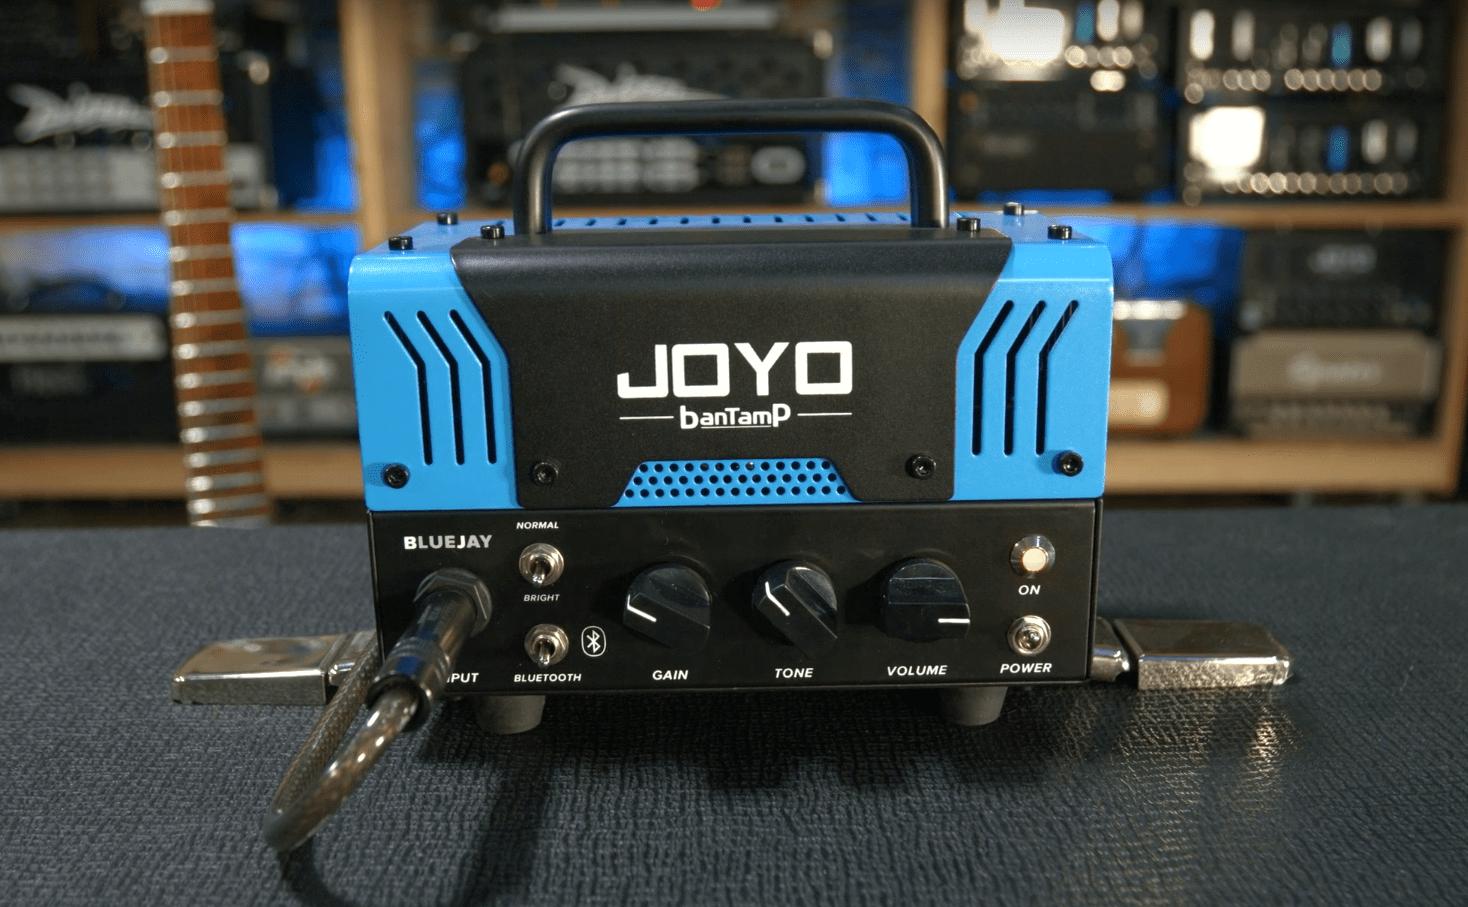 Test: Joyo Bantamp Bluejay, Gitarrenverstärker - AMAZONA de